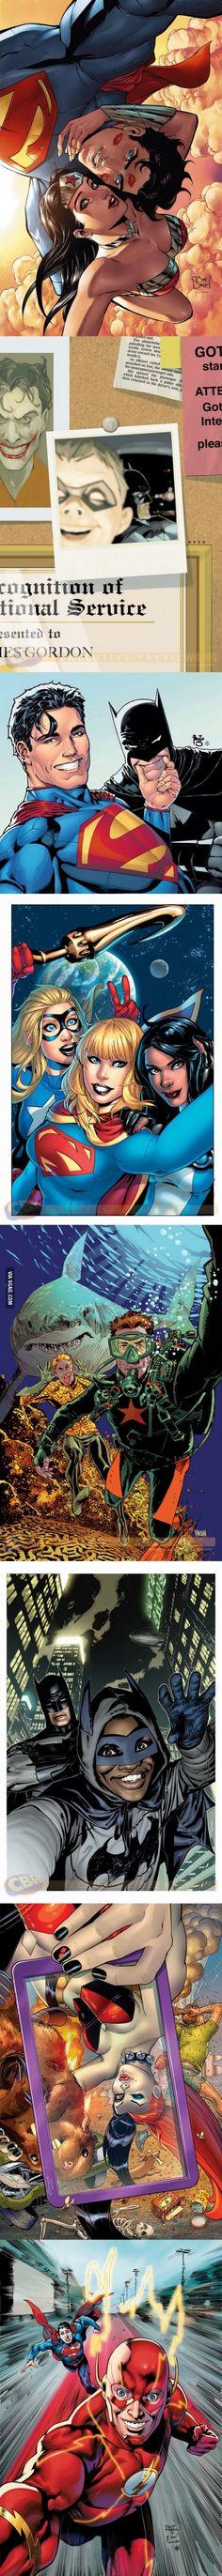 DC Comic Superhero and Villain Selfies Superman, Wonder Woman Batman Robin Harley Quinn Aquaman Flash and so on and so forth